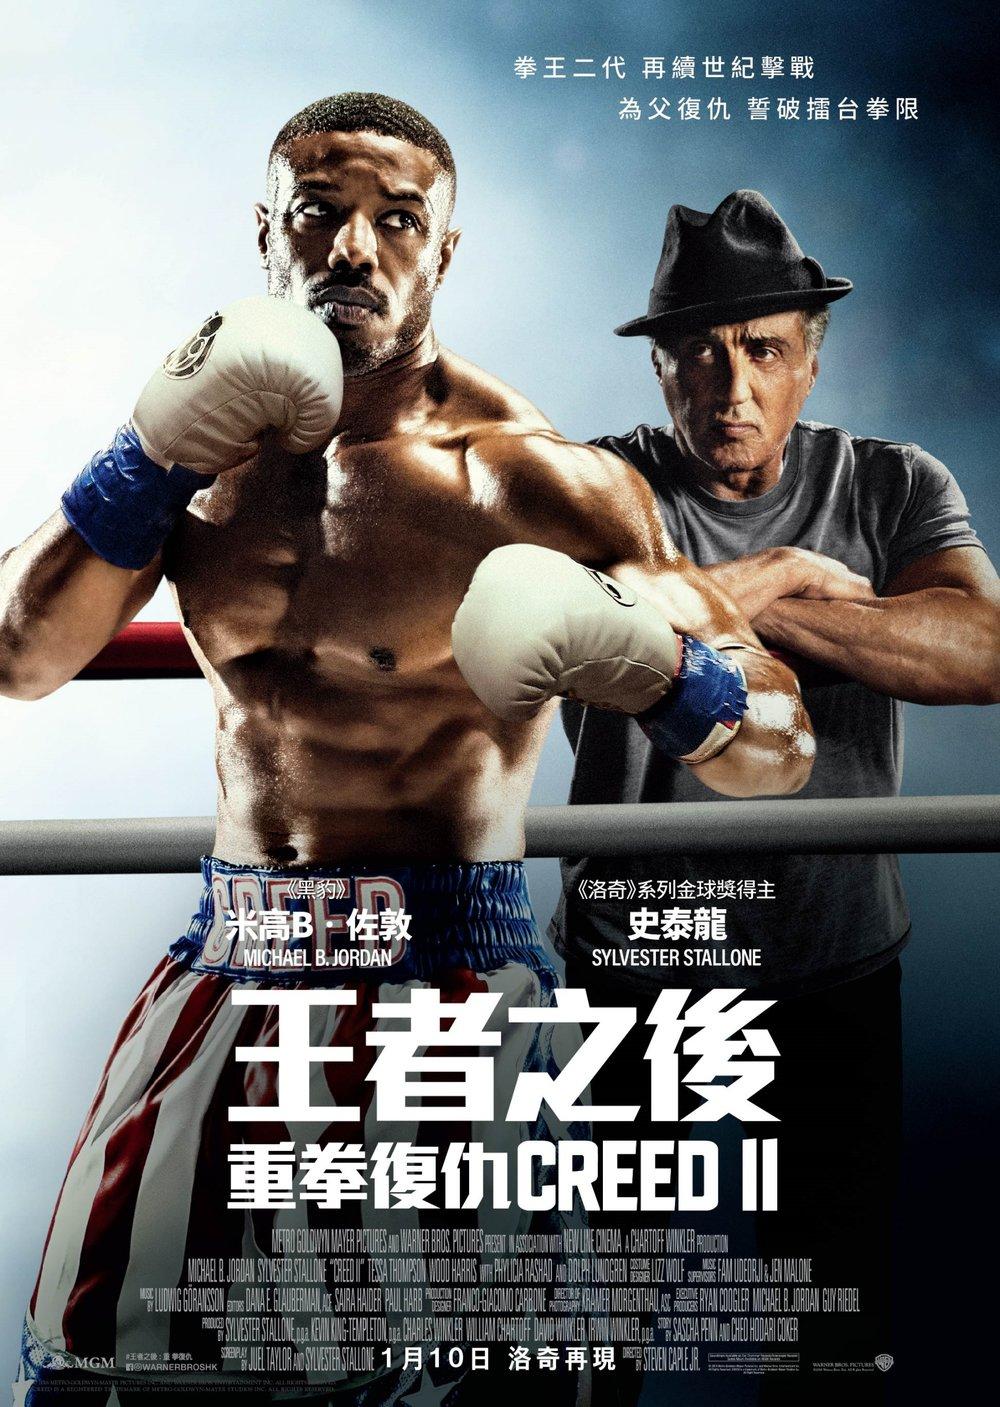 20181220_CreedII_Poster.jpg